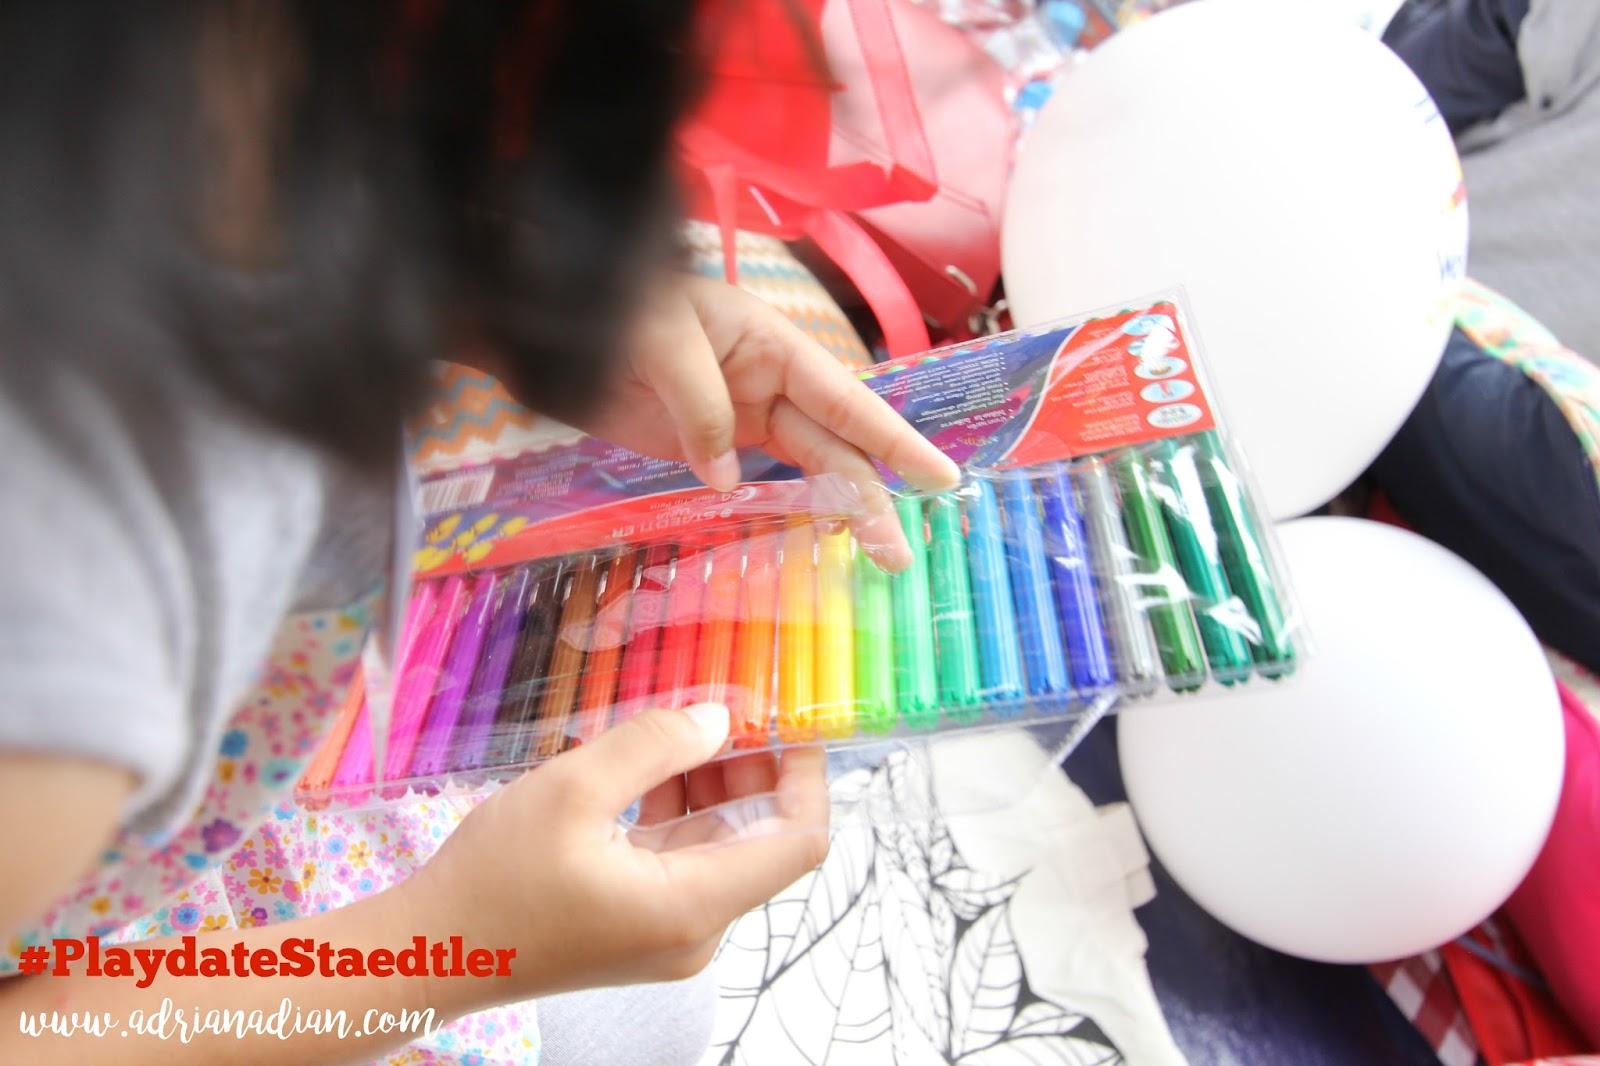 #PlaydateStaedtler Fun Colouring